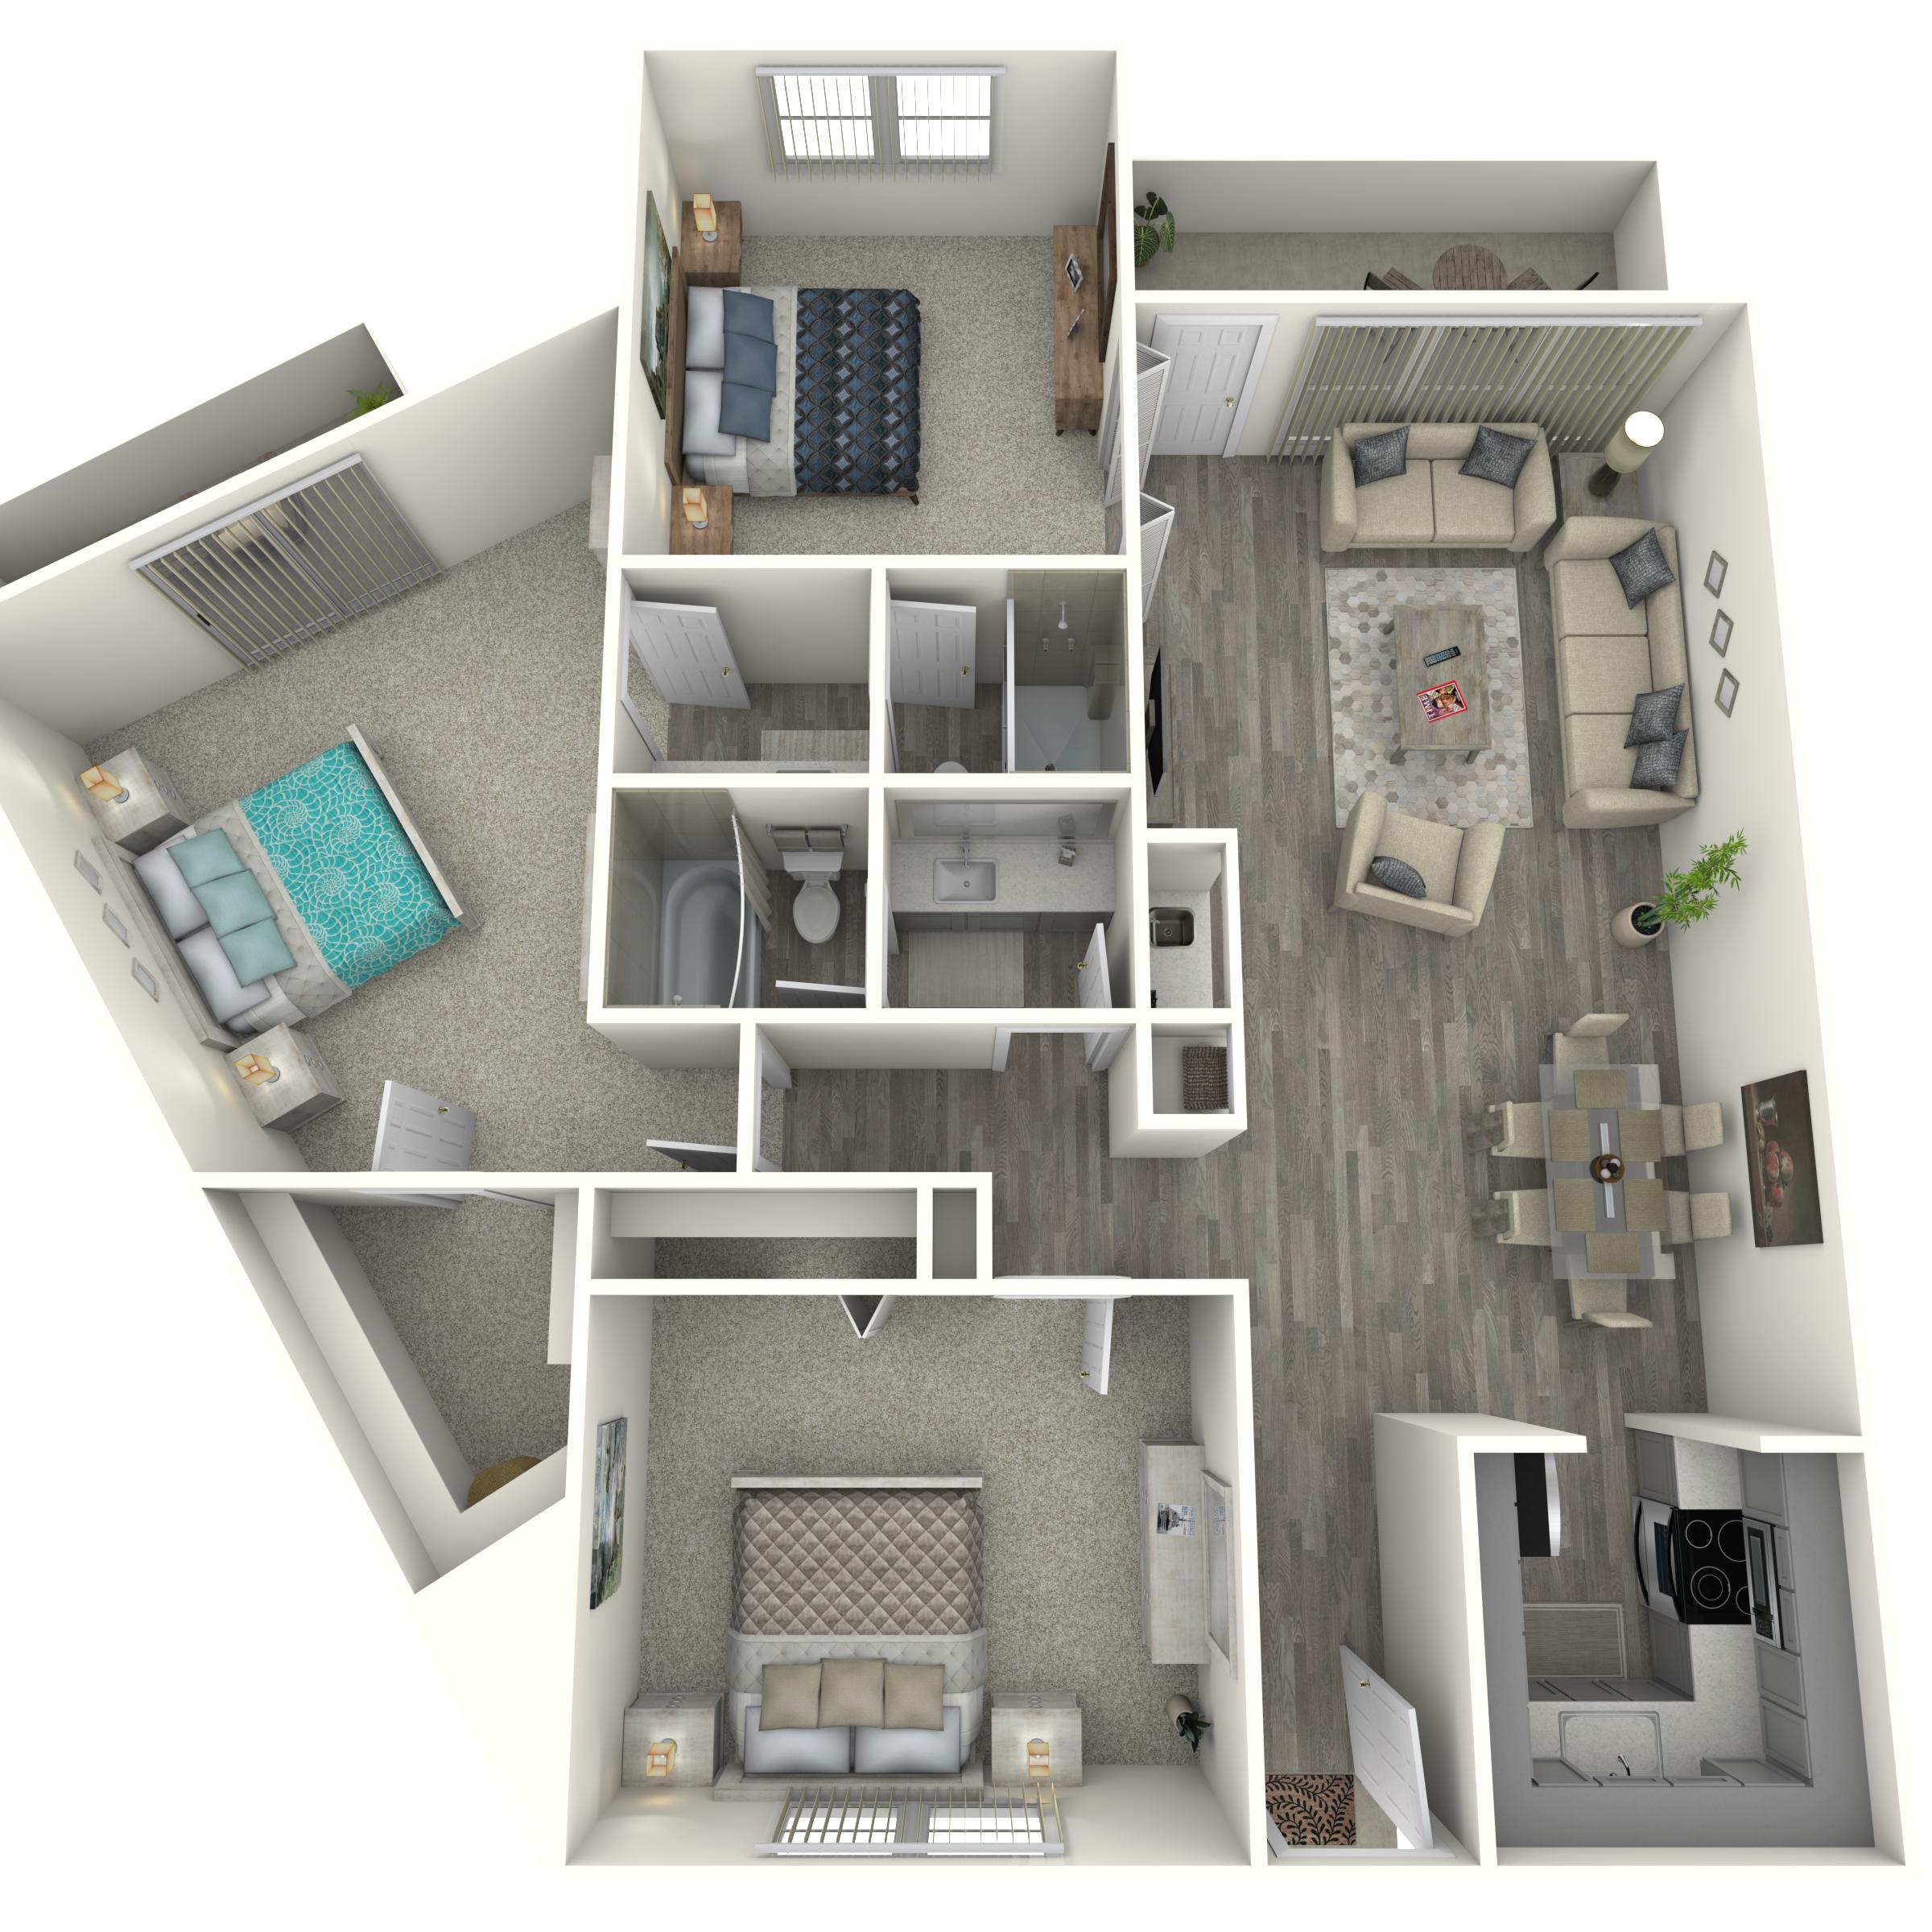 Floor plan image of 3x2 Renovated